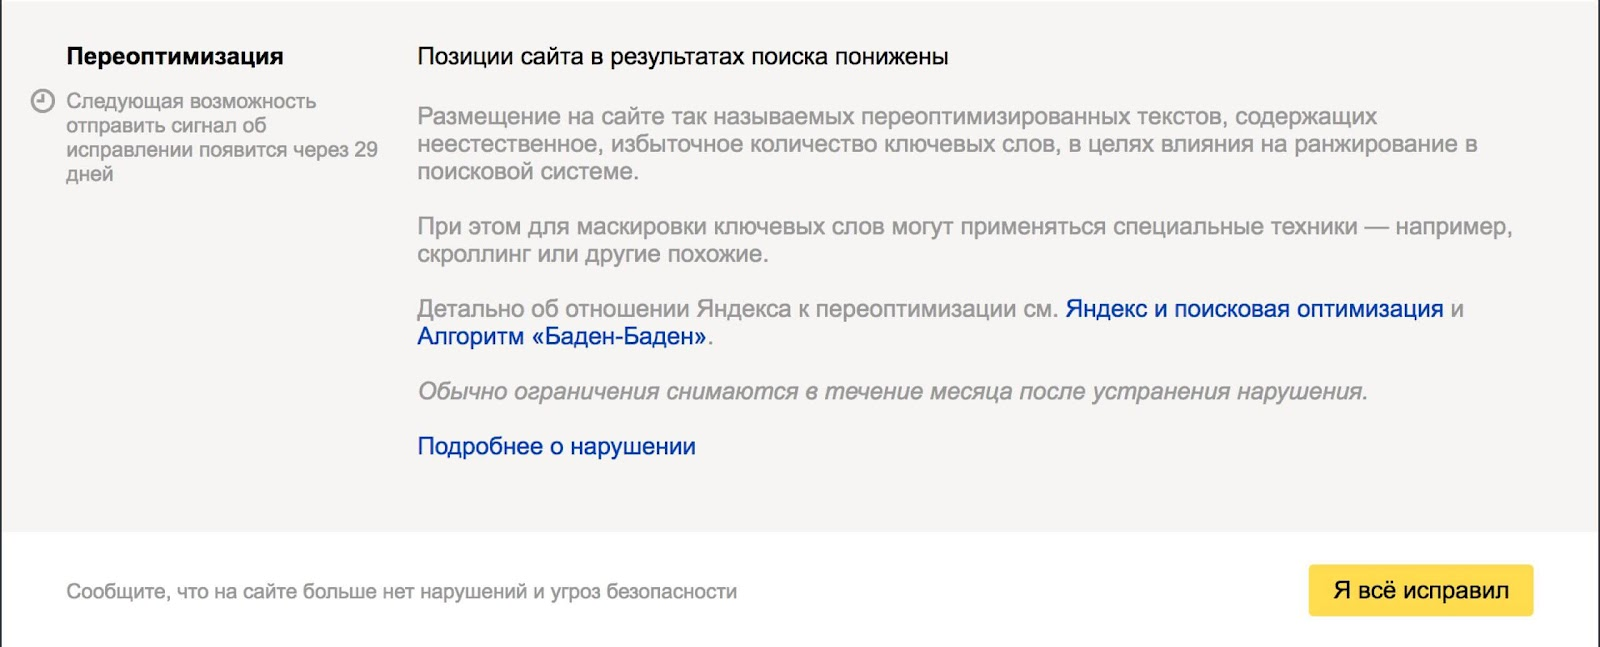 Сайт получил санкции от Яндекса за переоптимизацию